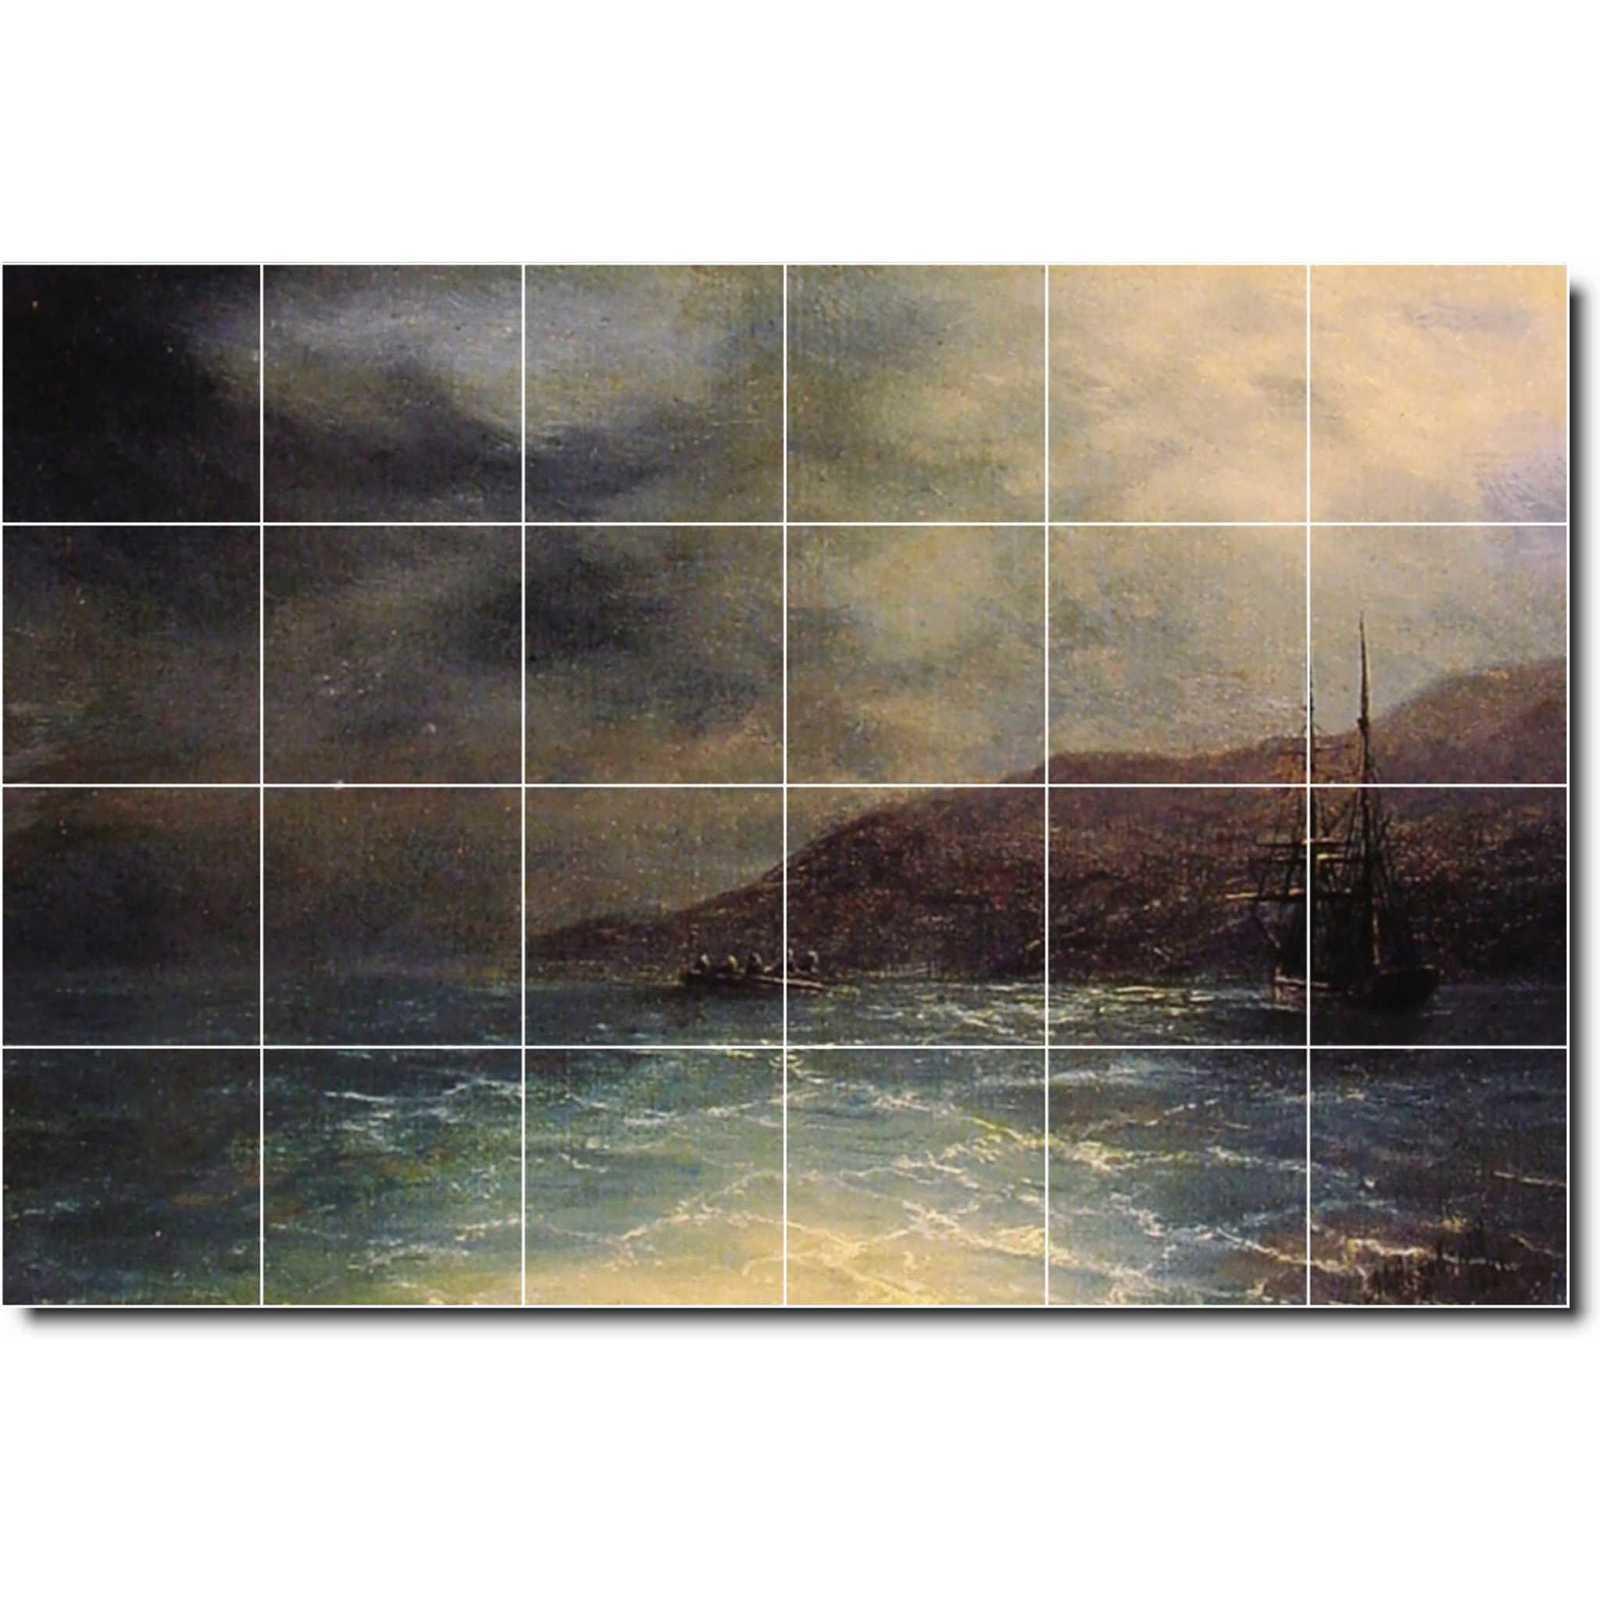 Aivazovsky ivan nocturnal voyage